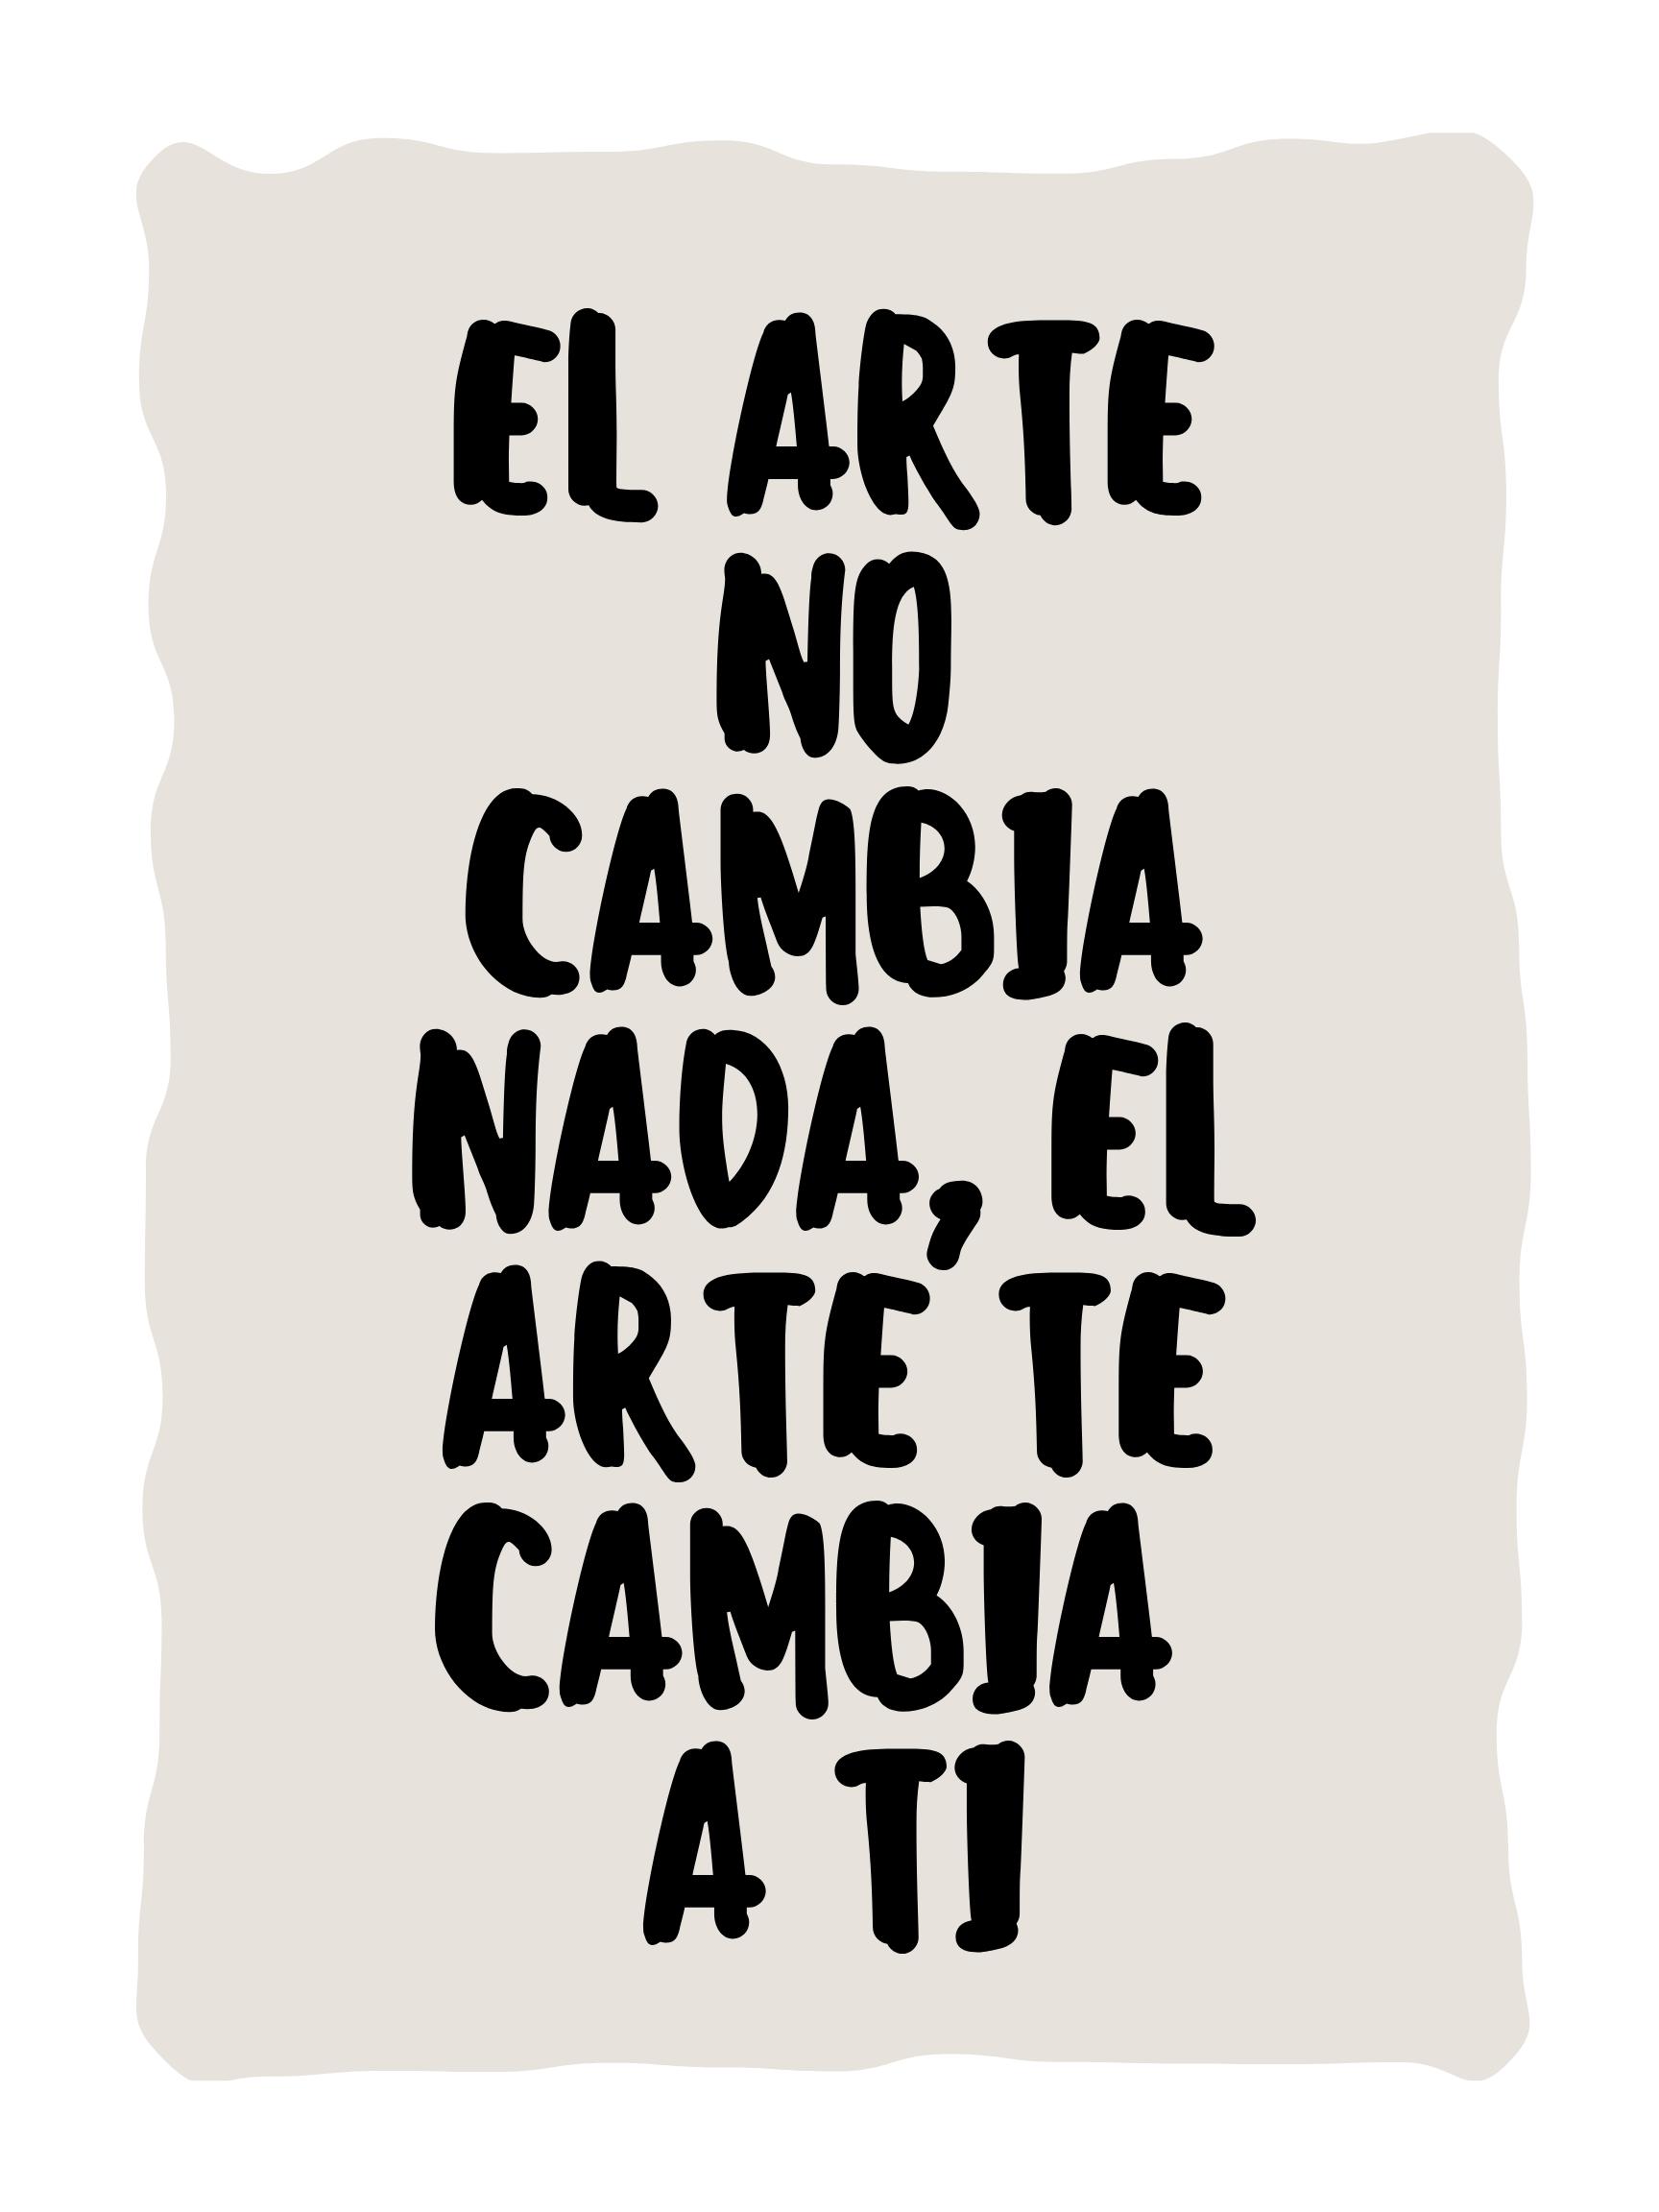 Frases Arte Dibujo Artemexicano Dibujos Frasesmotivadoras Bellasartes Dibujosalapiz Frasesbonita S Frases De Arte Dibujos Tradicionales Frases Diarias